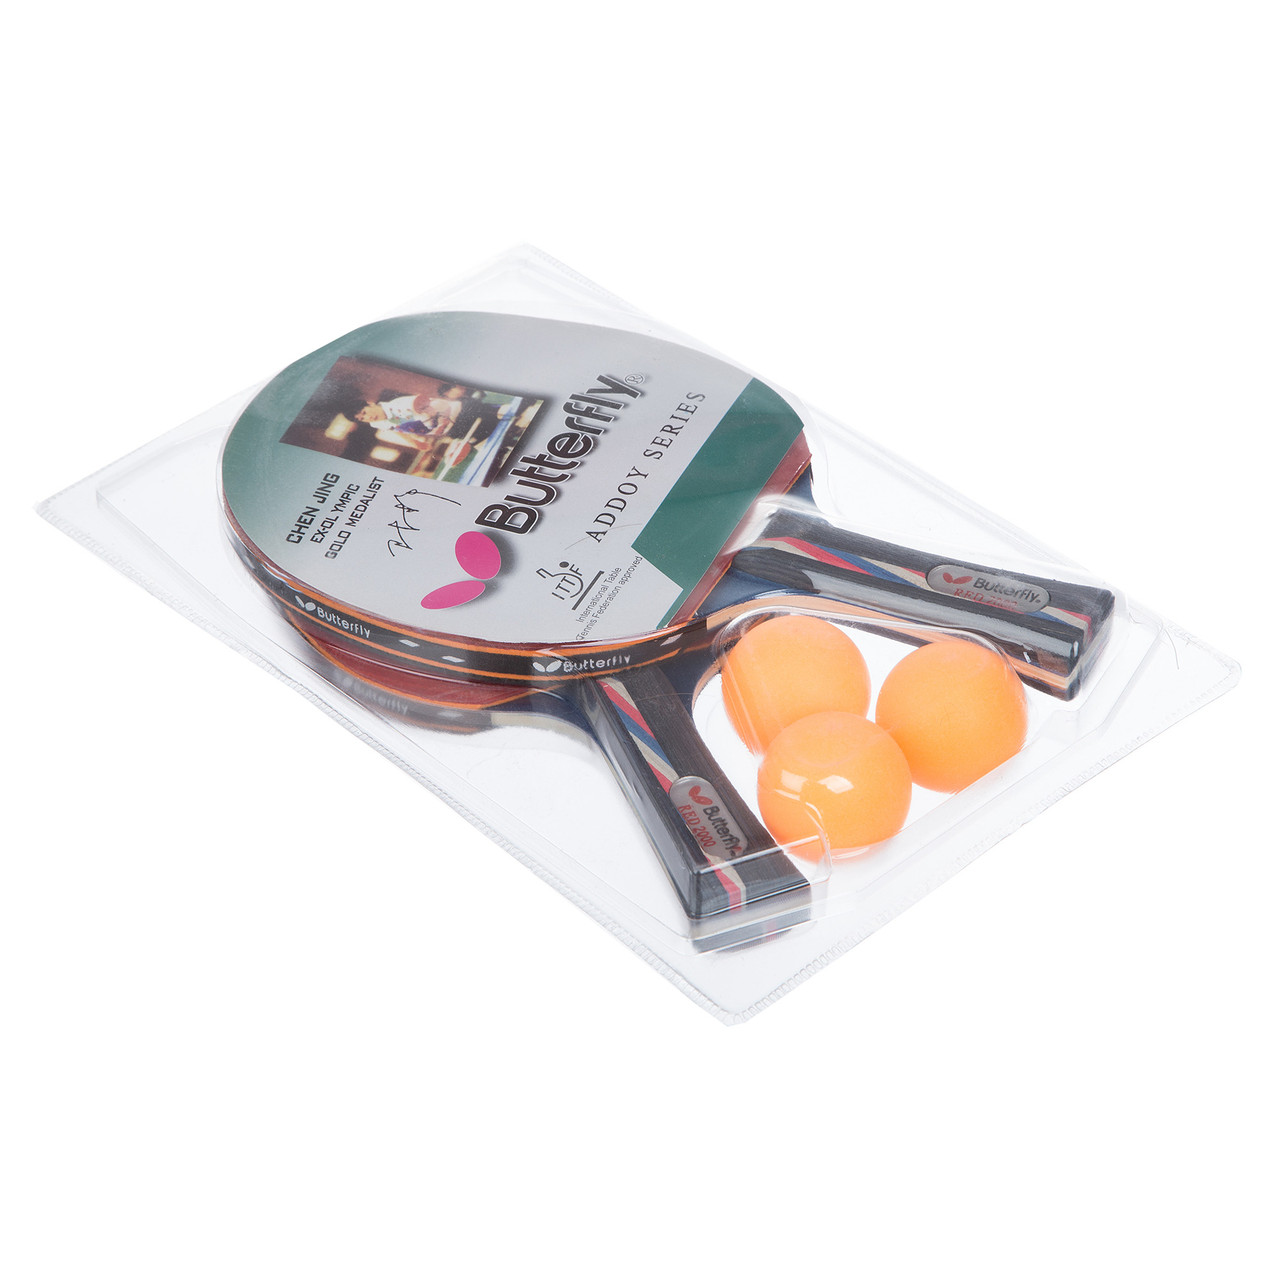 Набор для настольного тенниса 2 ракетки, 3 мяча Butterfly MT-1273